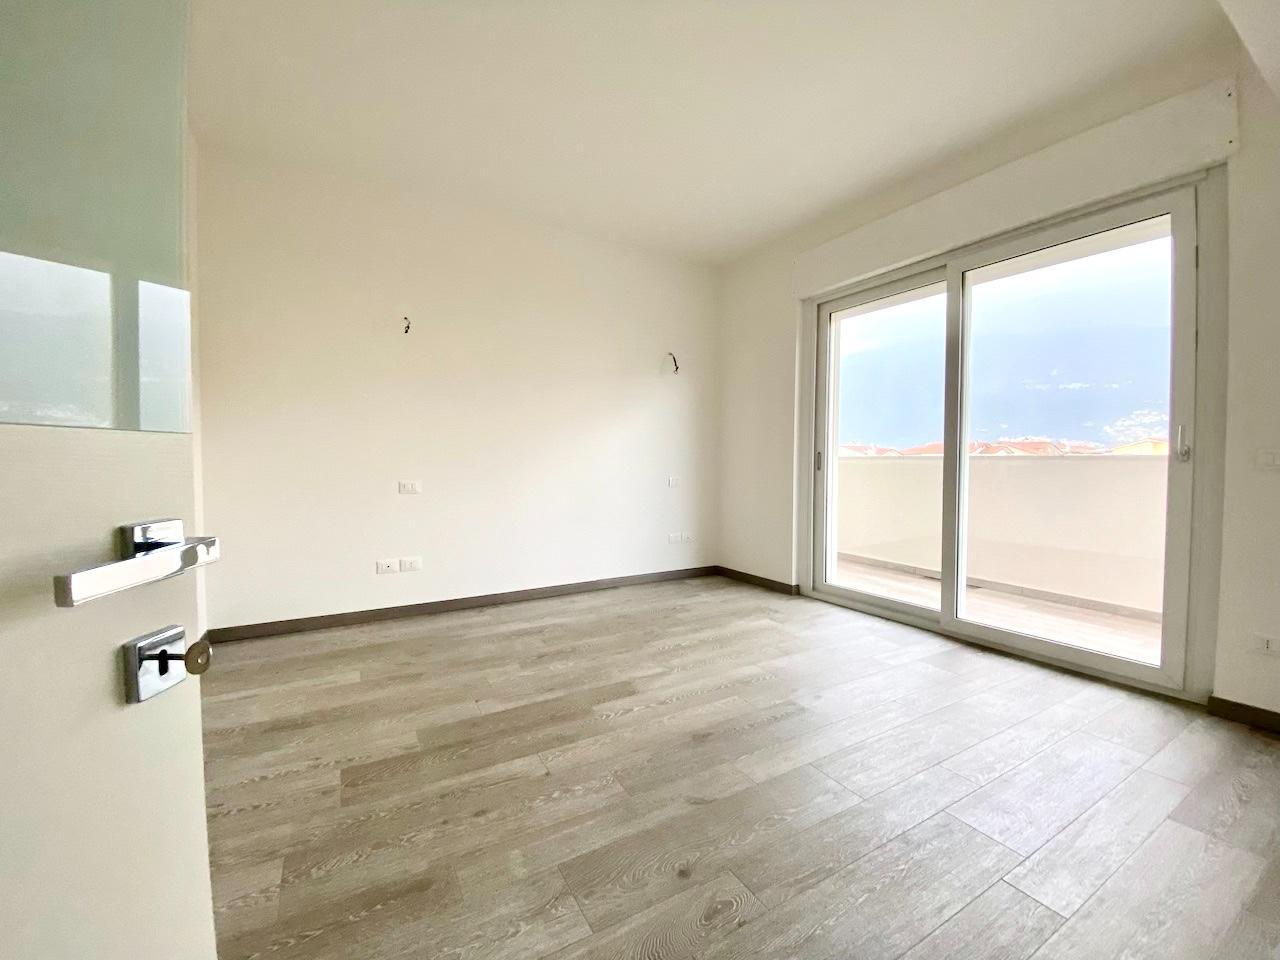 Appartamento in vendita, rif. LOG-544